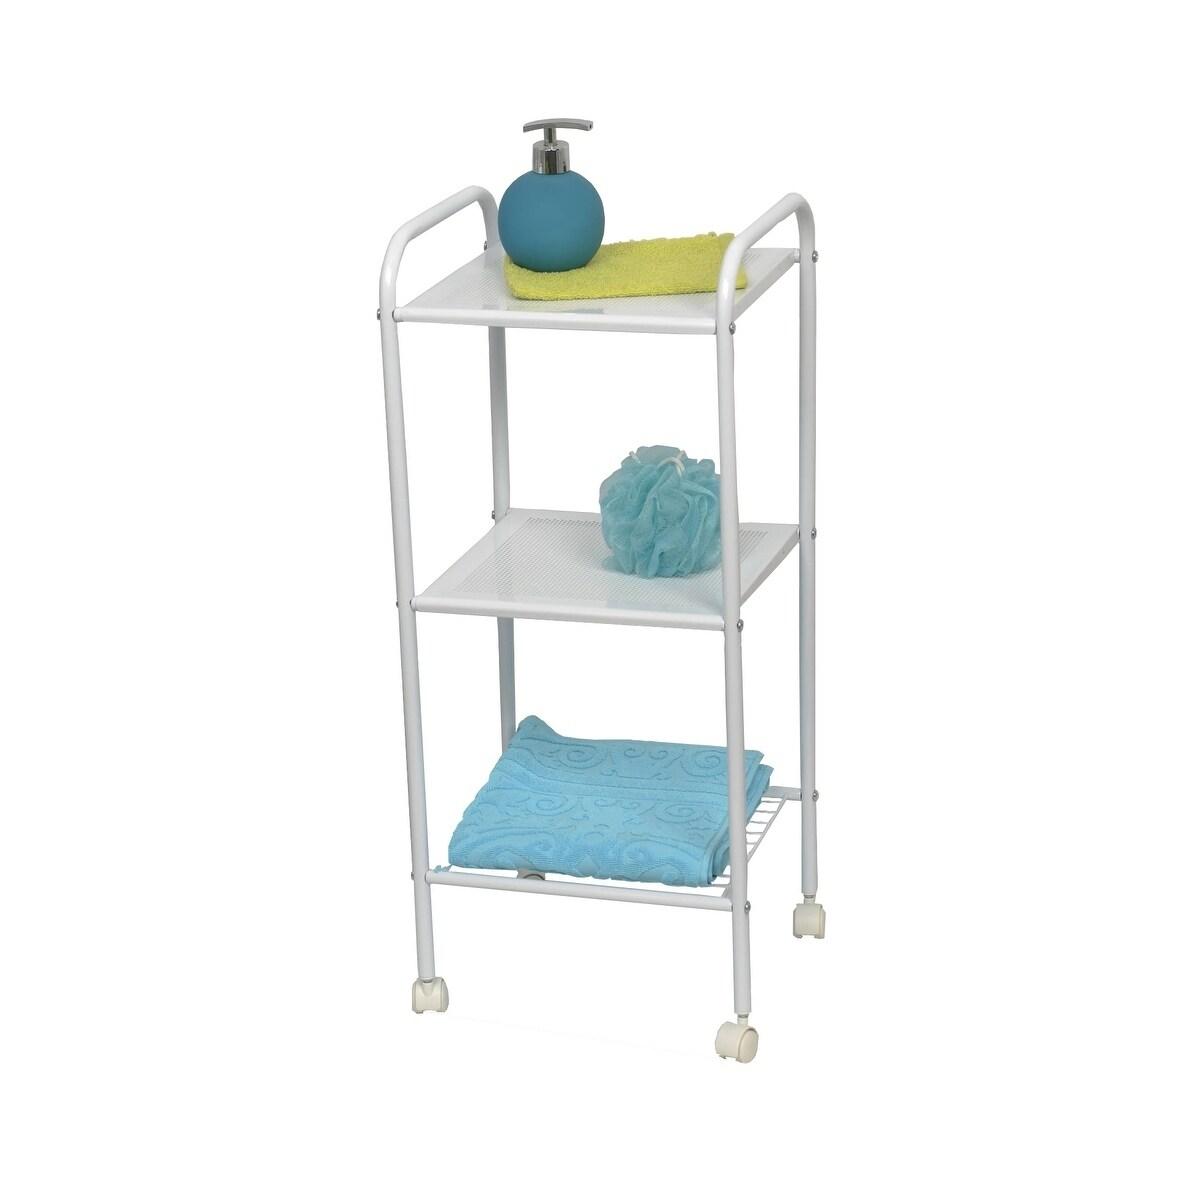 Shop Evideco Bathroom Storage Rolling Cart 3 Shelves Metal White ...